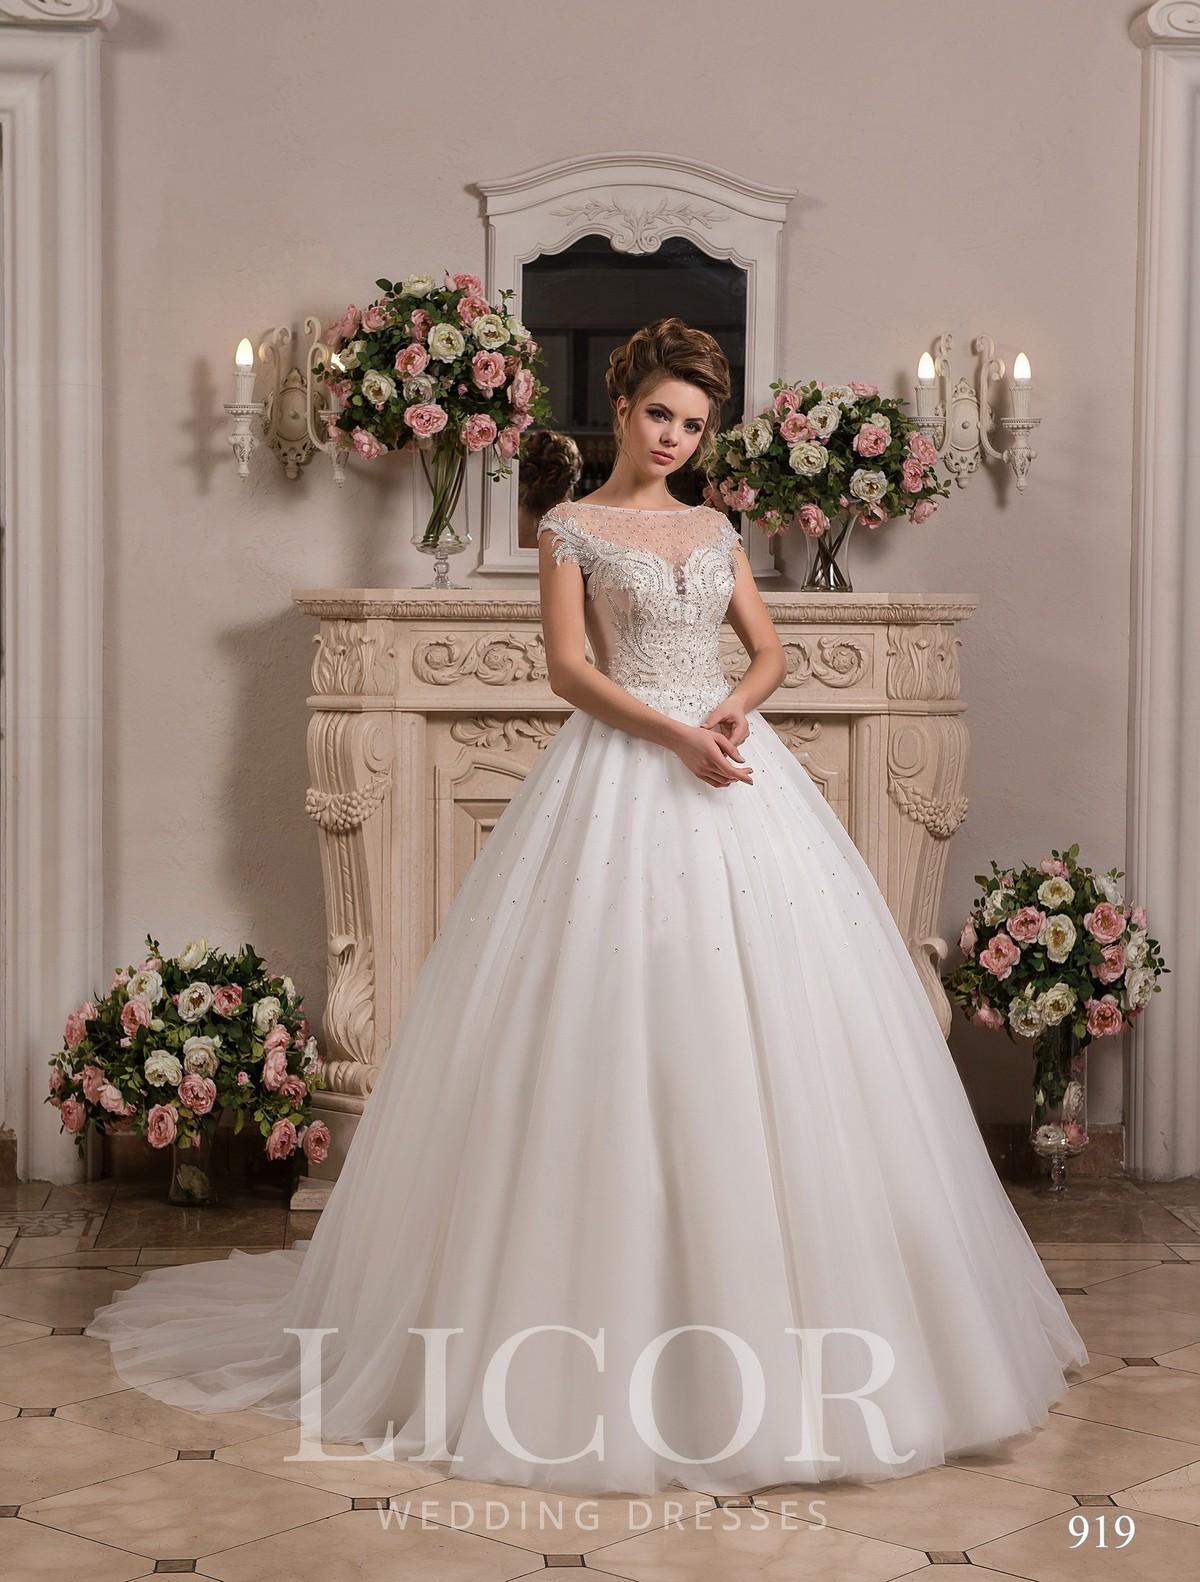 https://licor.com.ua/images/stories/virtuemart/product/919(1).jpg